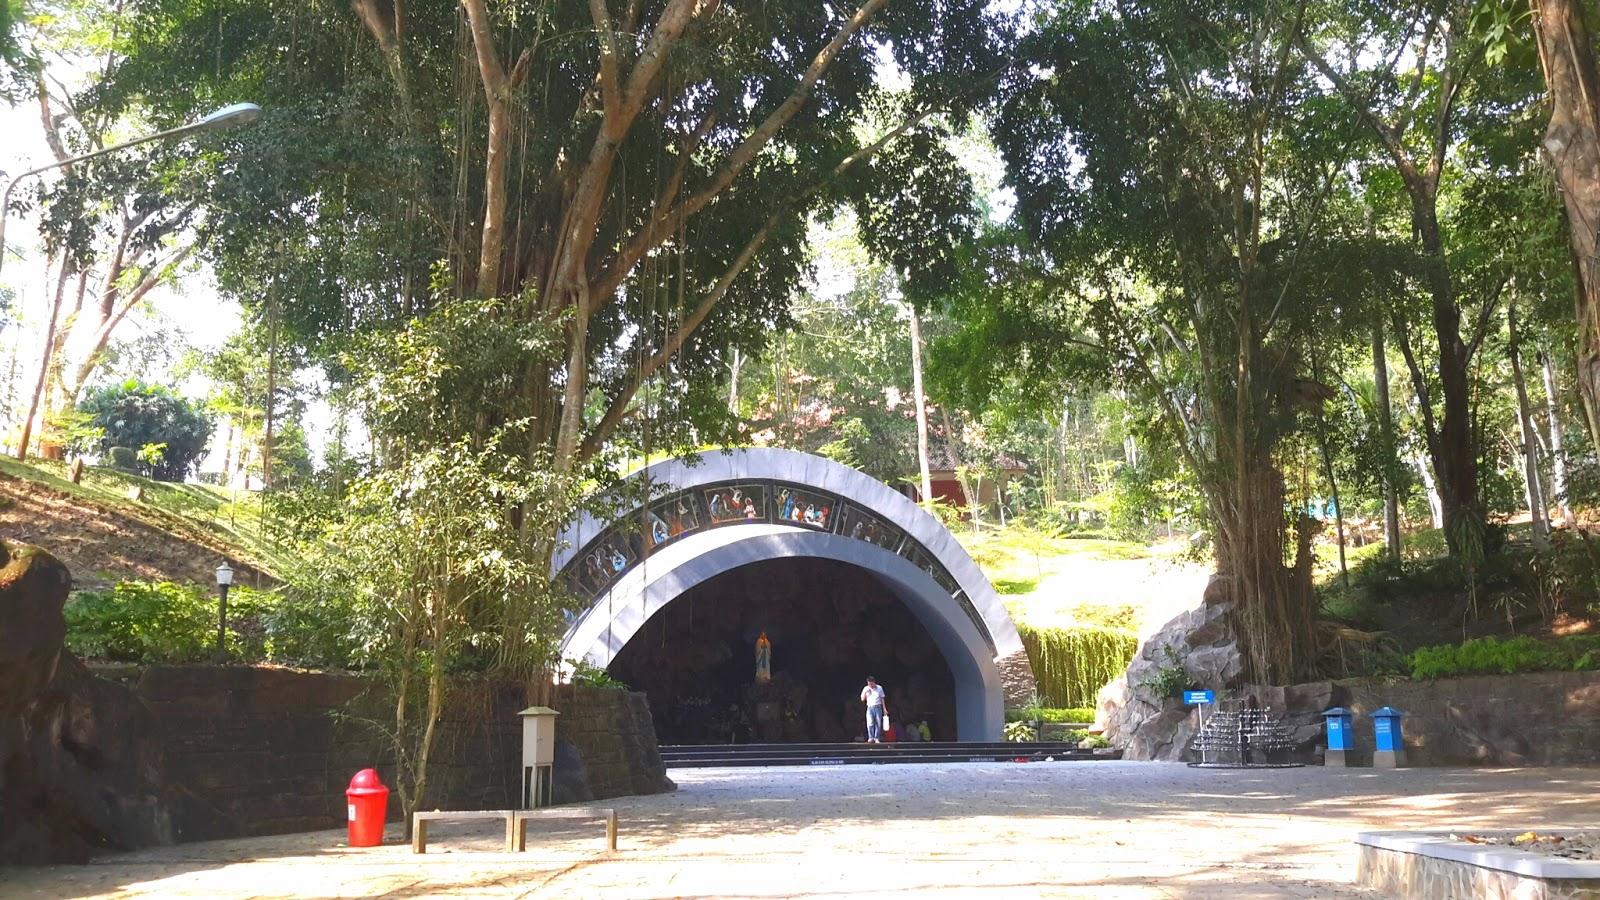 Keindahan Wisata Gua Maria Kaliori Trend Purwokerto Pula Patung Bunda